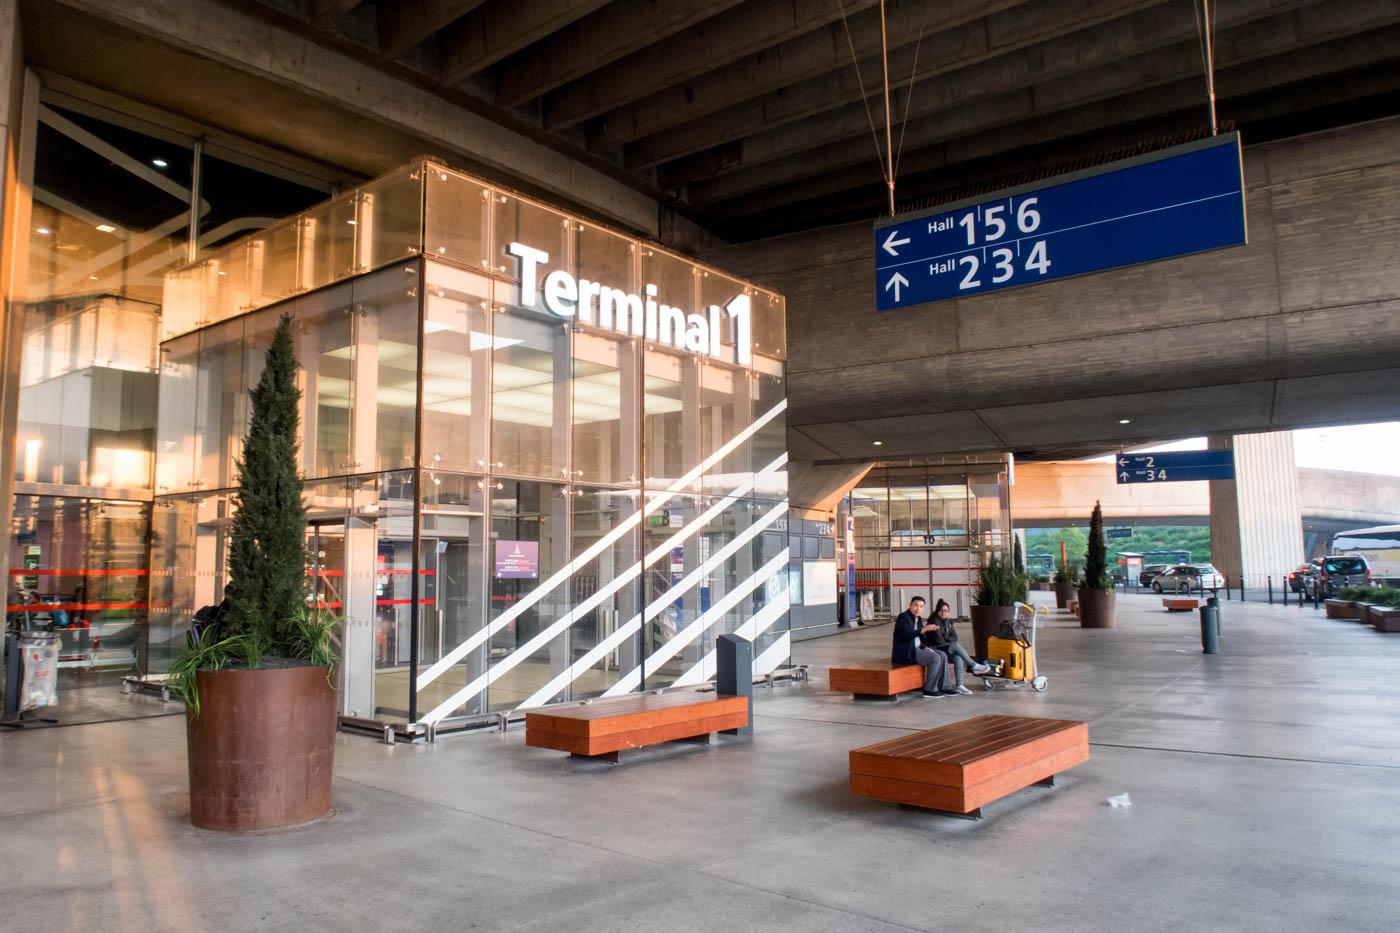 Paris Charles de Gaulle Airport Terminal 1 Exterior